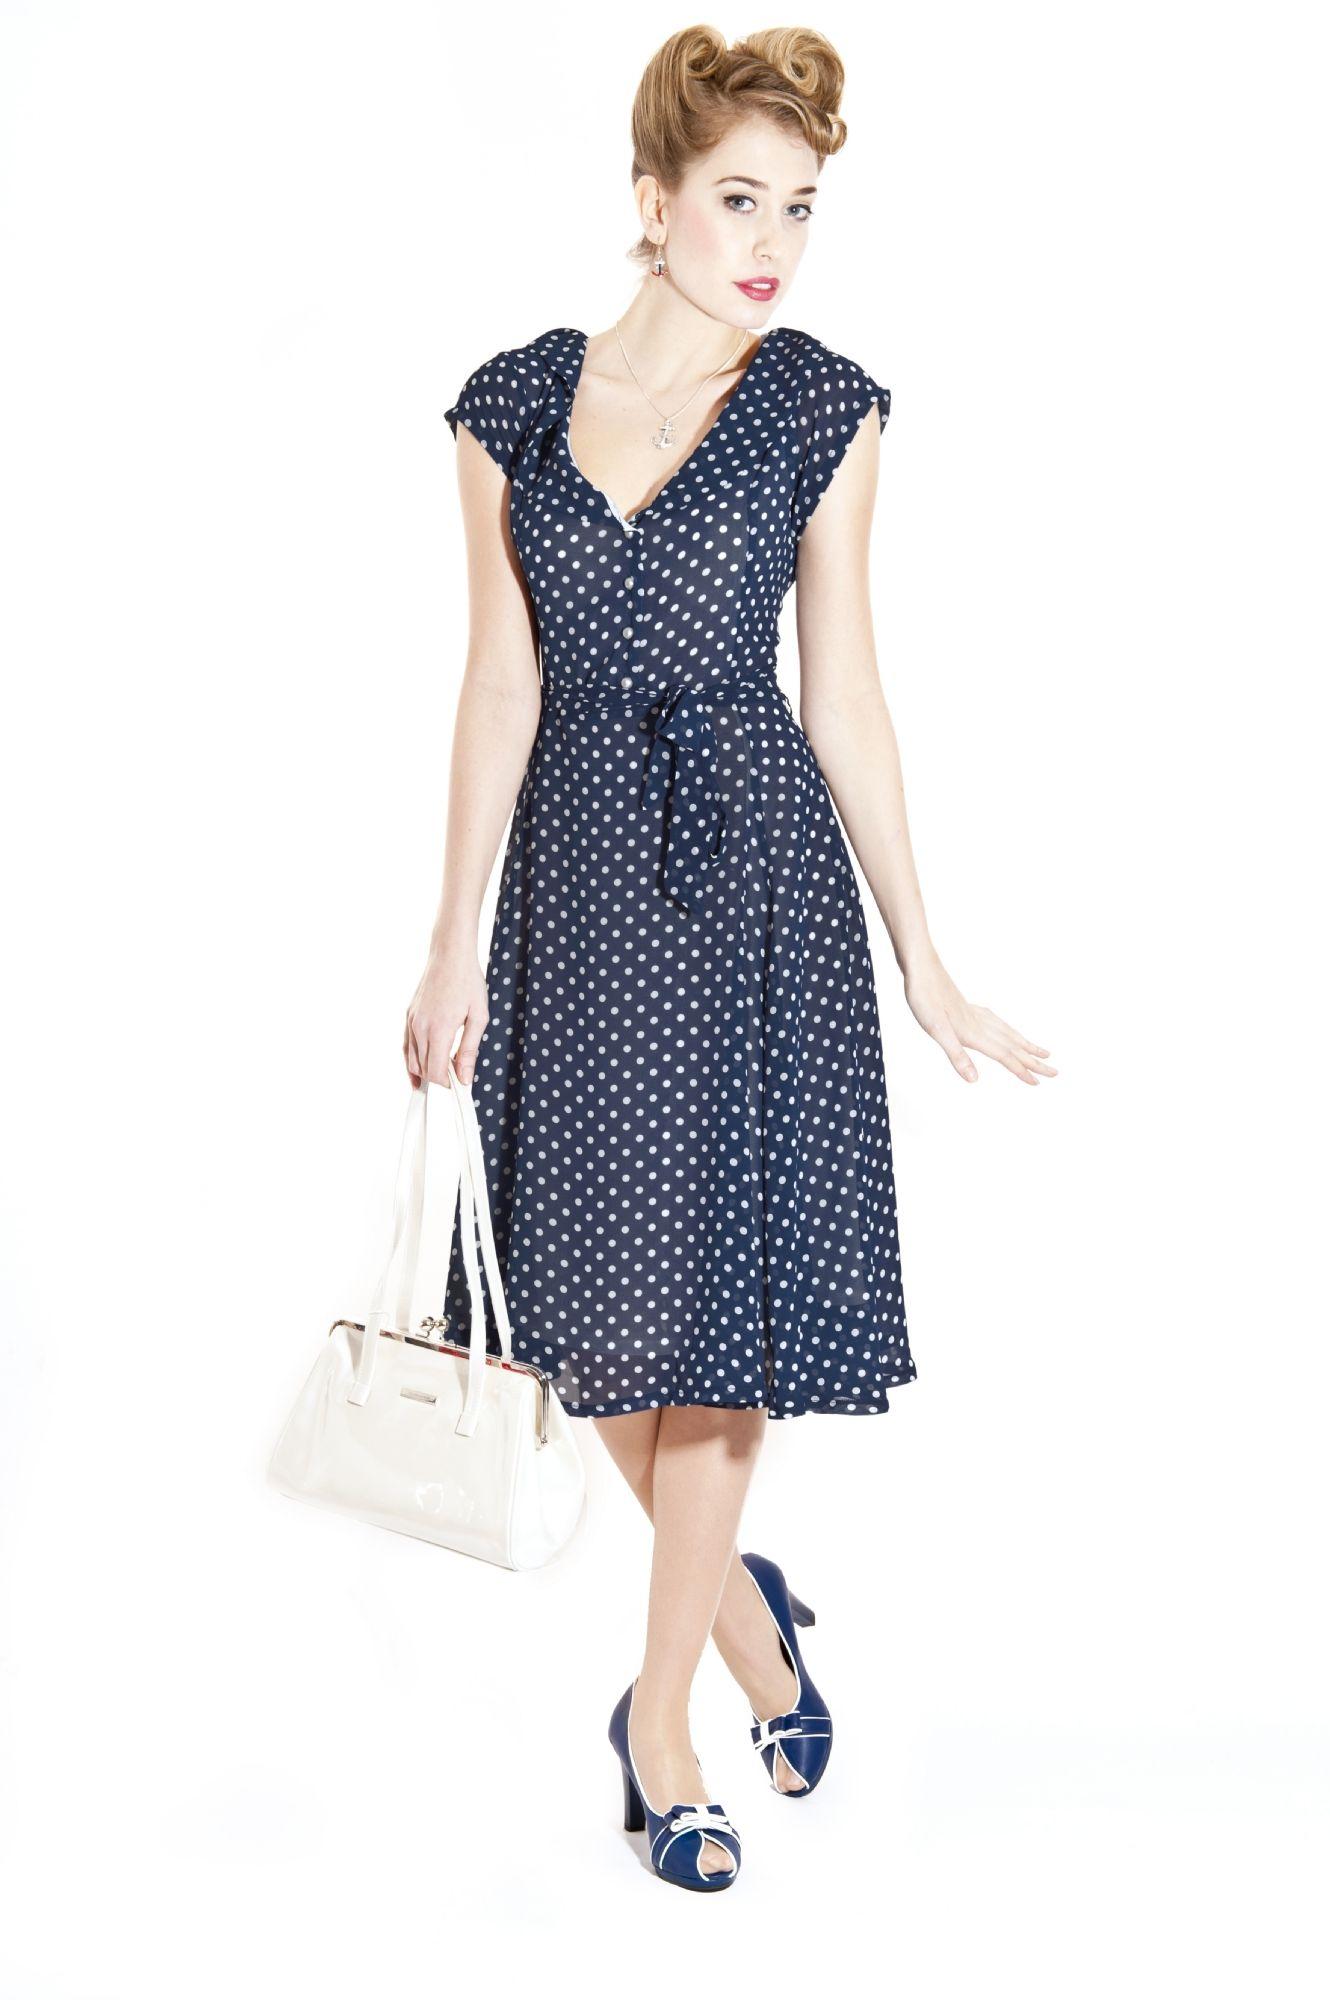 Violet Polka Dot Print Dress | huynh thi le hoa | Pinterest | Polka ...